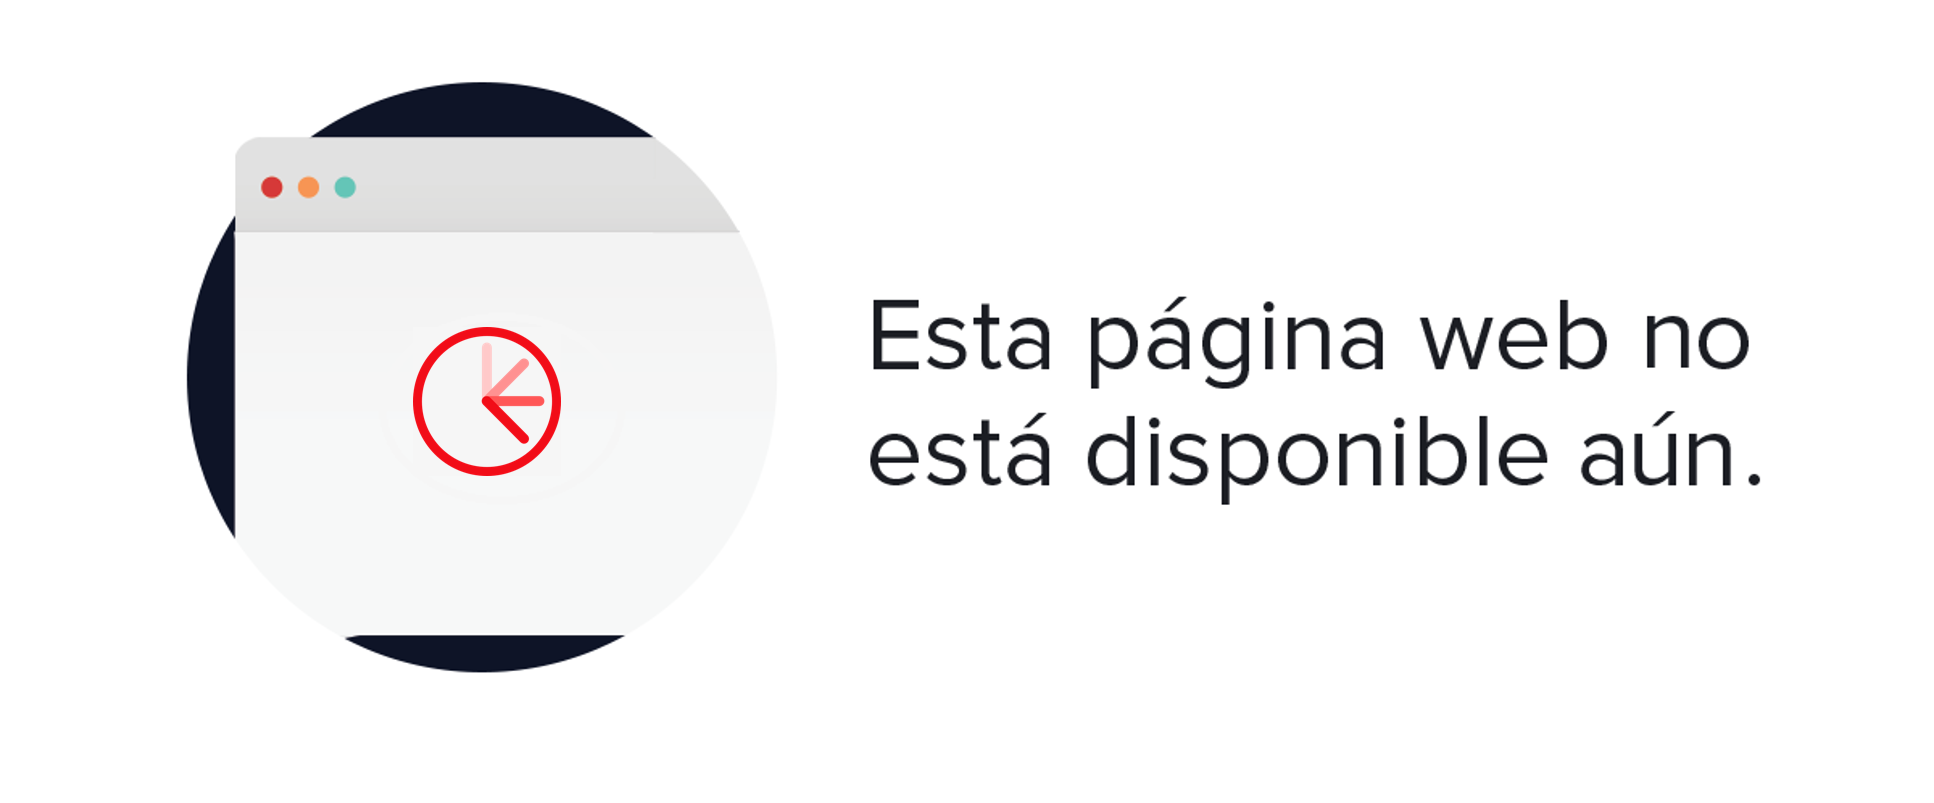 Boutique Moschino - Chaqueta de tweed de mujer Boutique Moschino Negro 001089566200922038 - WHHDKED